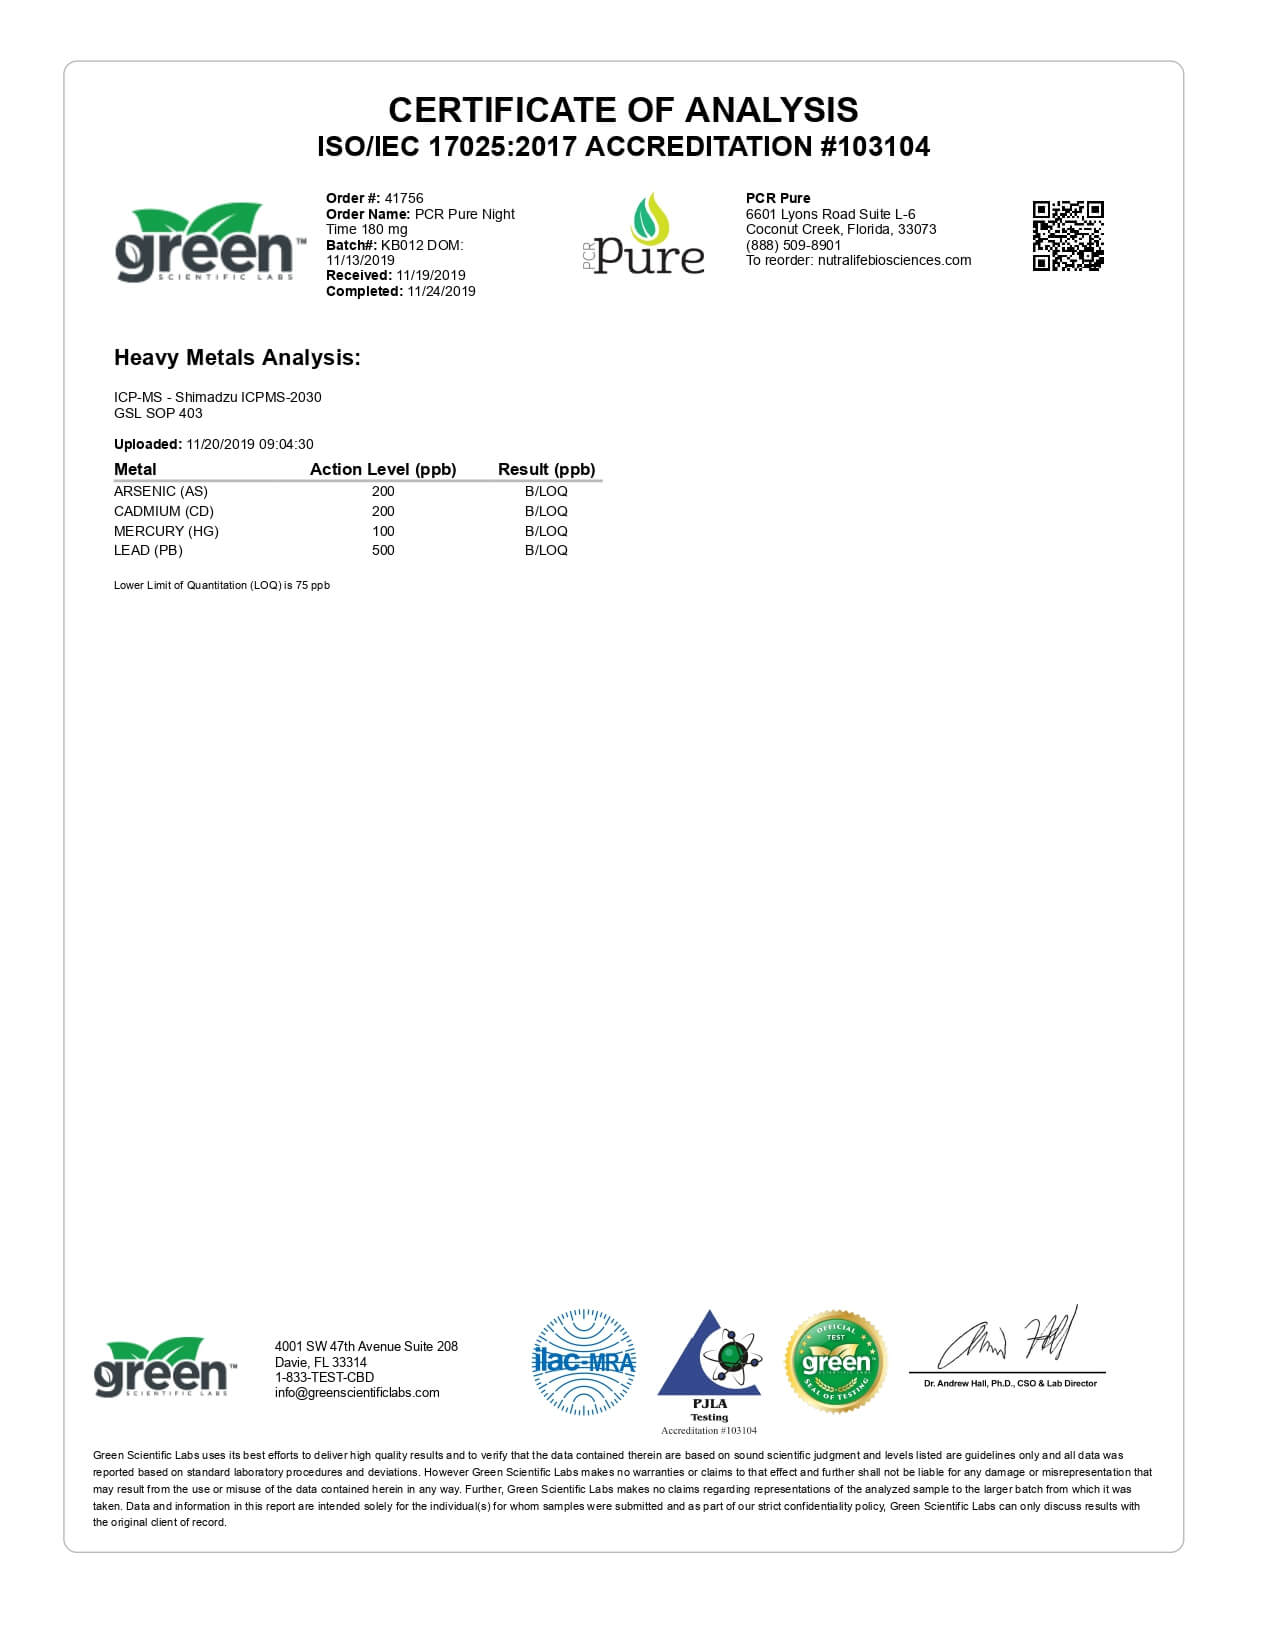 PCR Pure CBD Tincture Spray Full Spectrum Nighttime Formula Lab Report